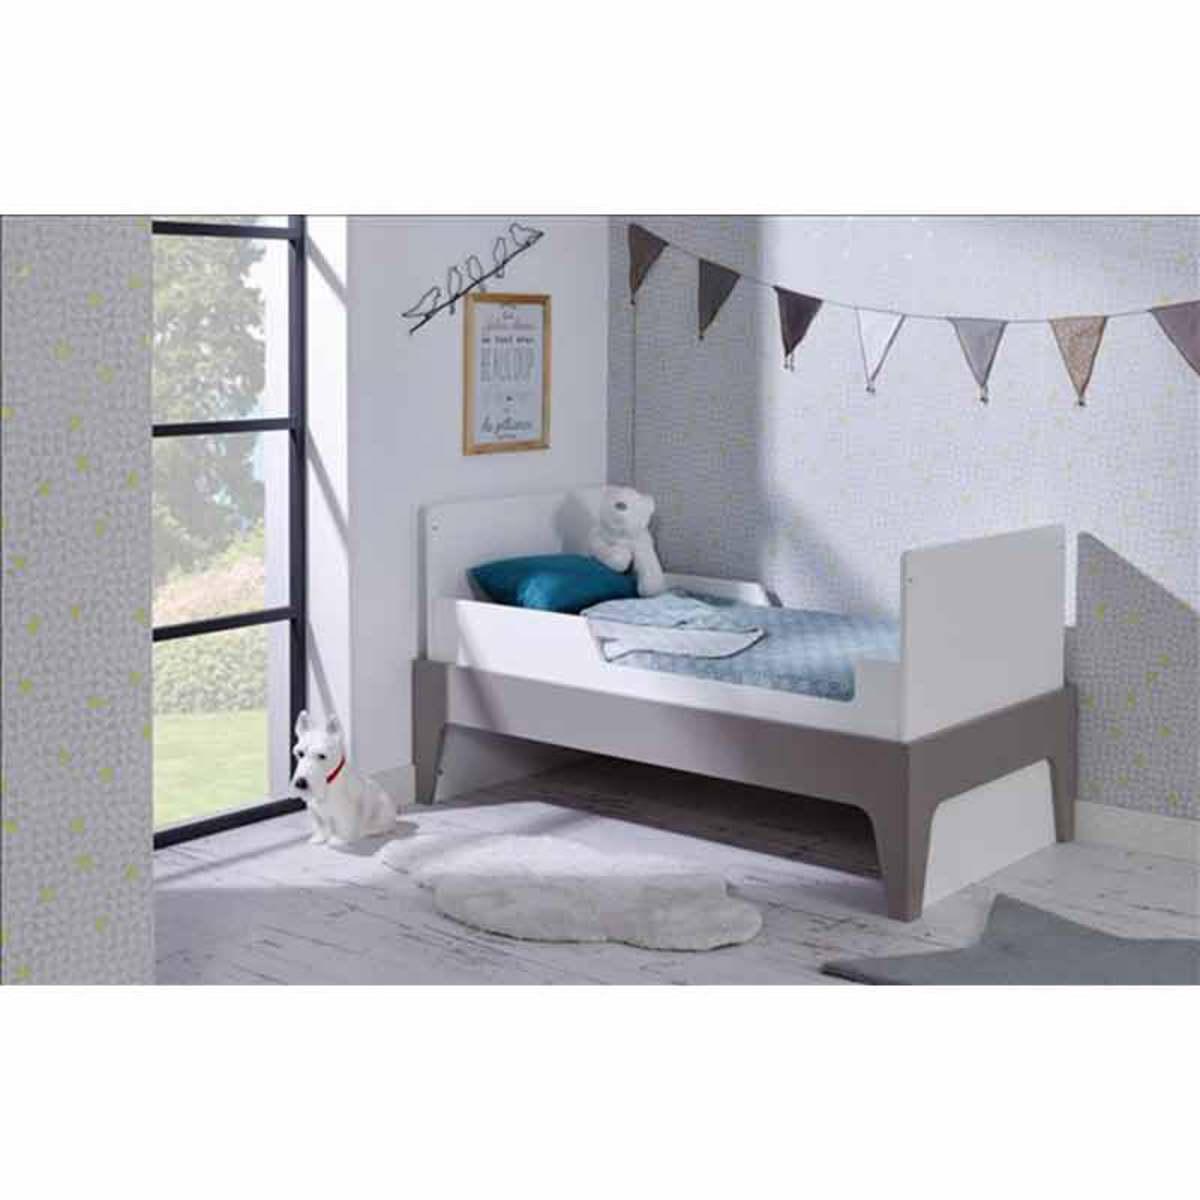 b b provence lit b b 70 x 140 cm paris evolutif barreaux blanc lin lit b b b b provence. Black Bedroom Furniture Sets. Home Design Ideas